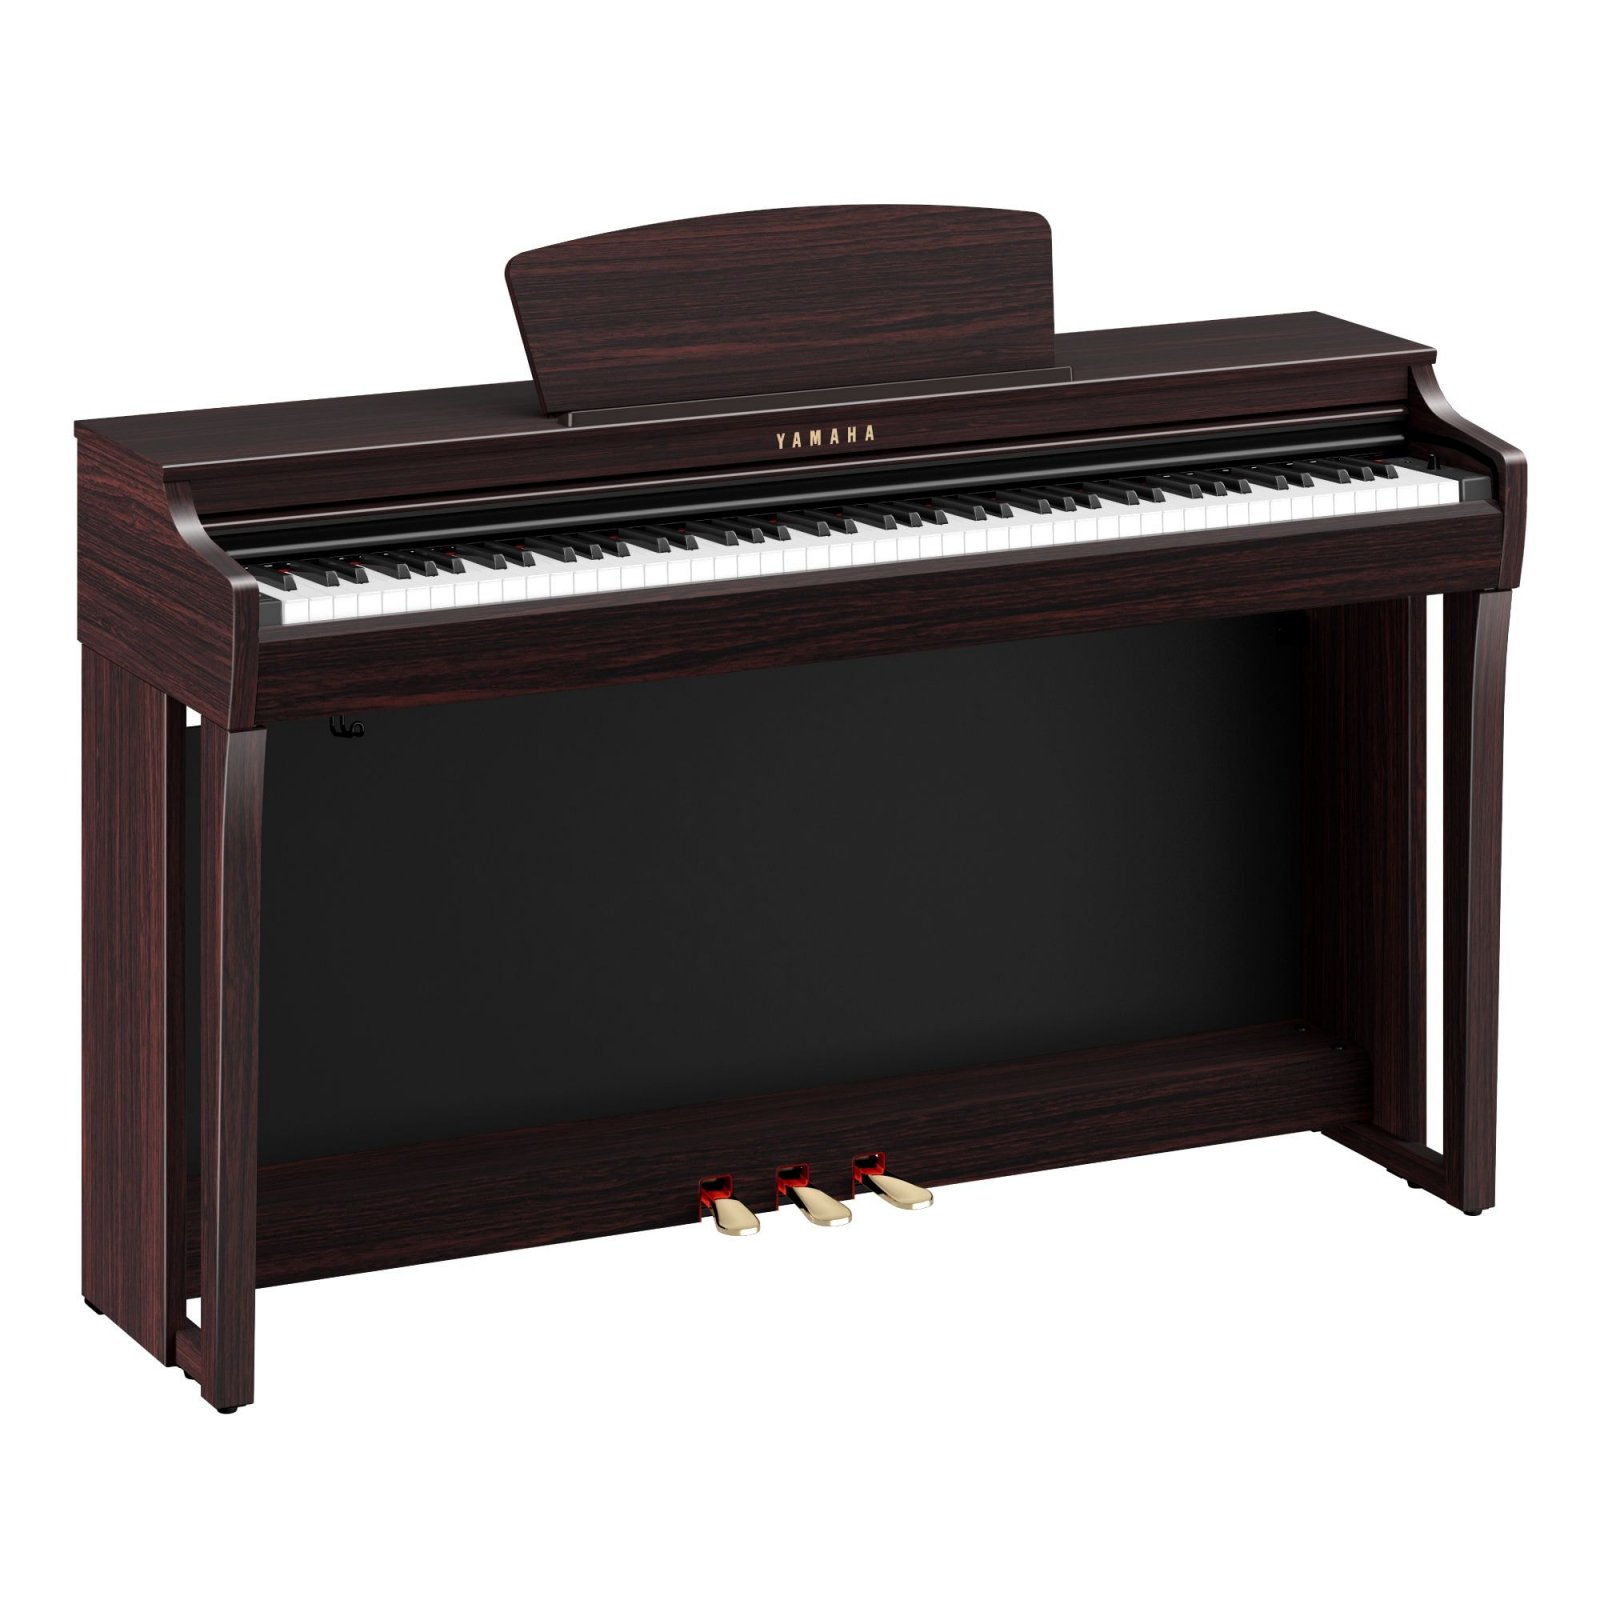 Yamaha CLP725 Clavinova Console Digital Piano